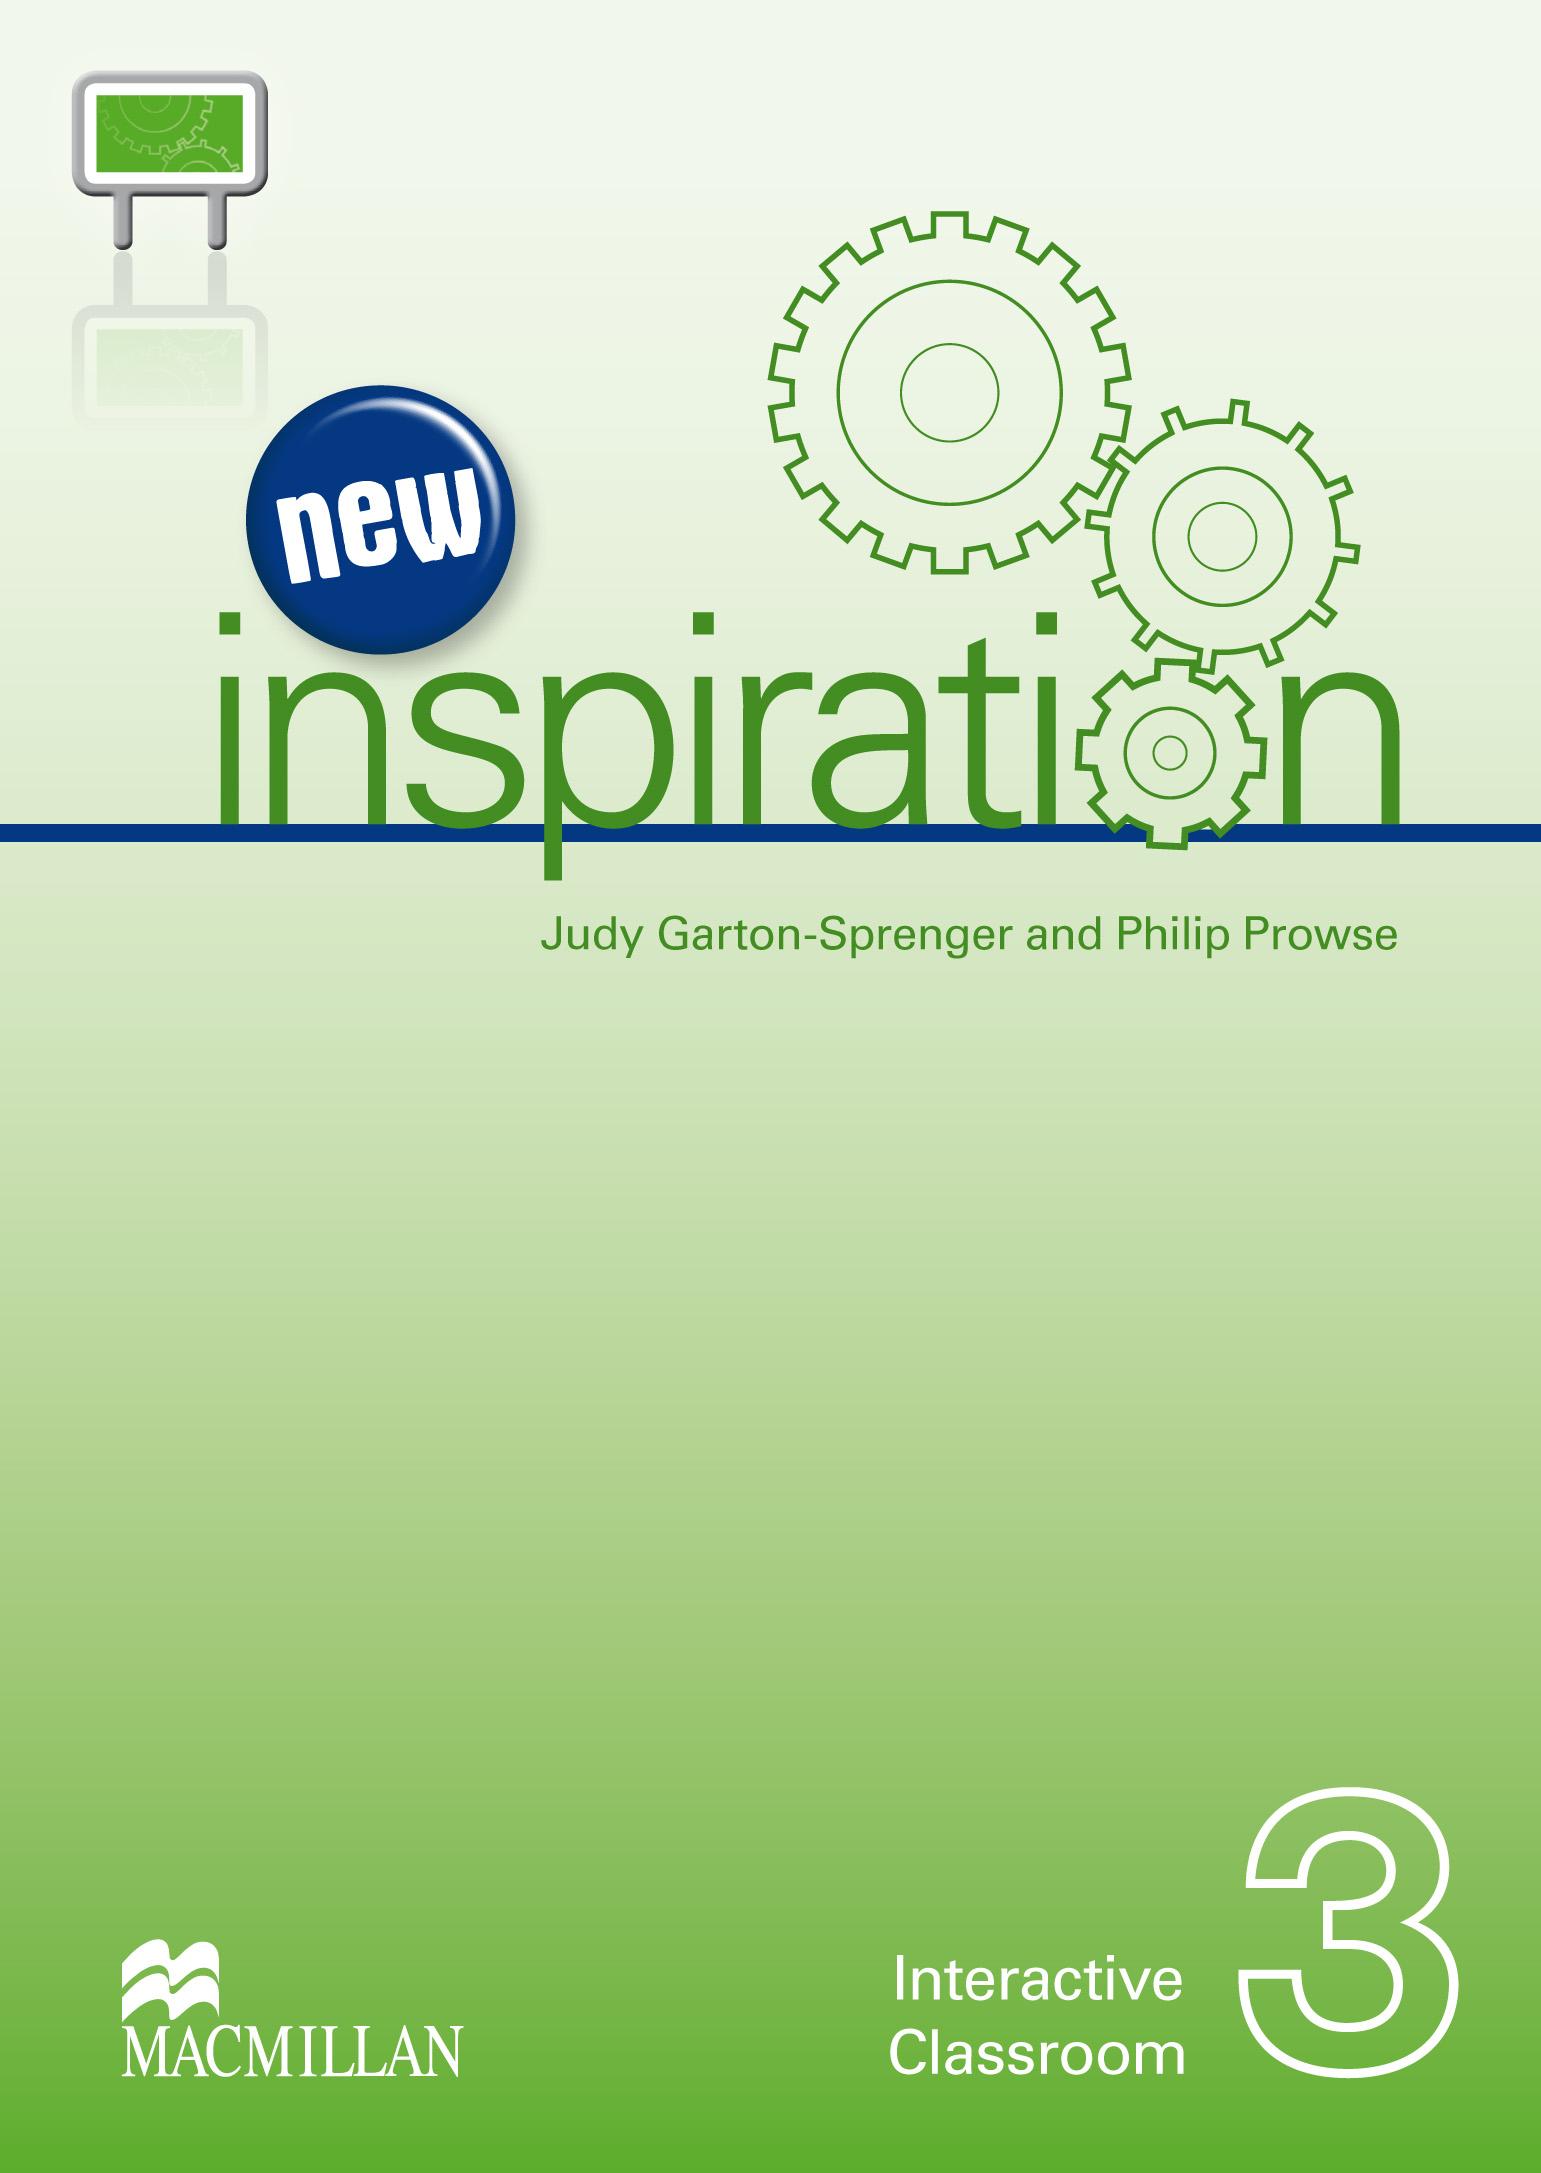 New Inspiration Interactive Classroom 3